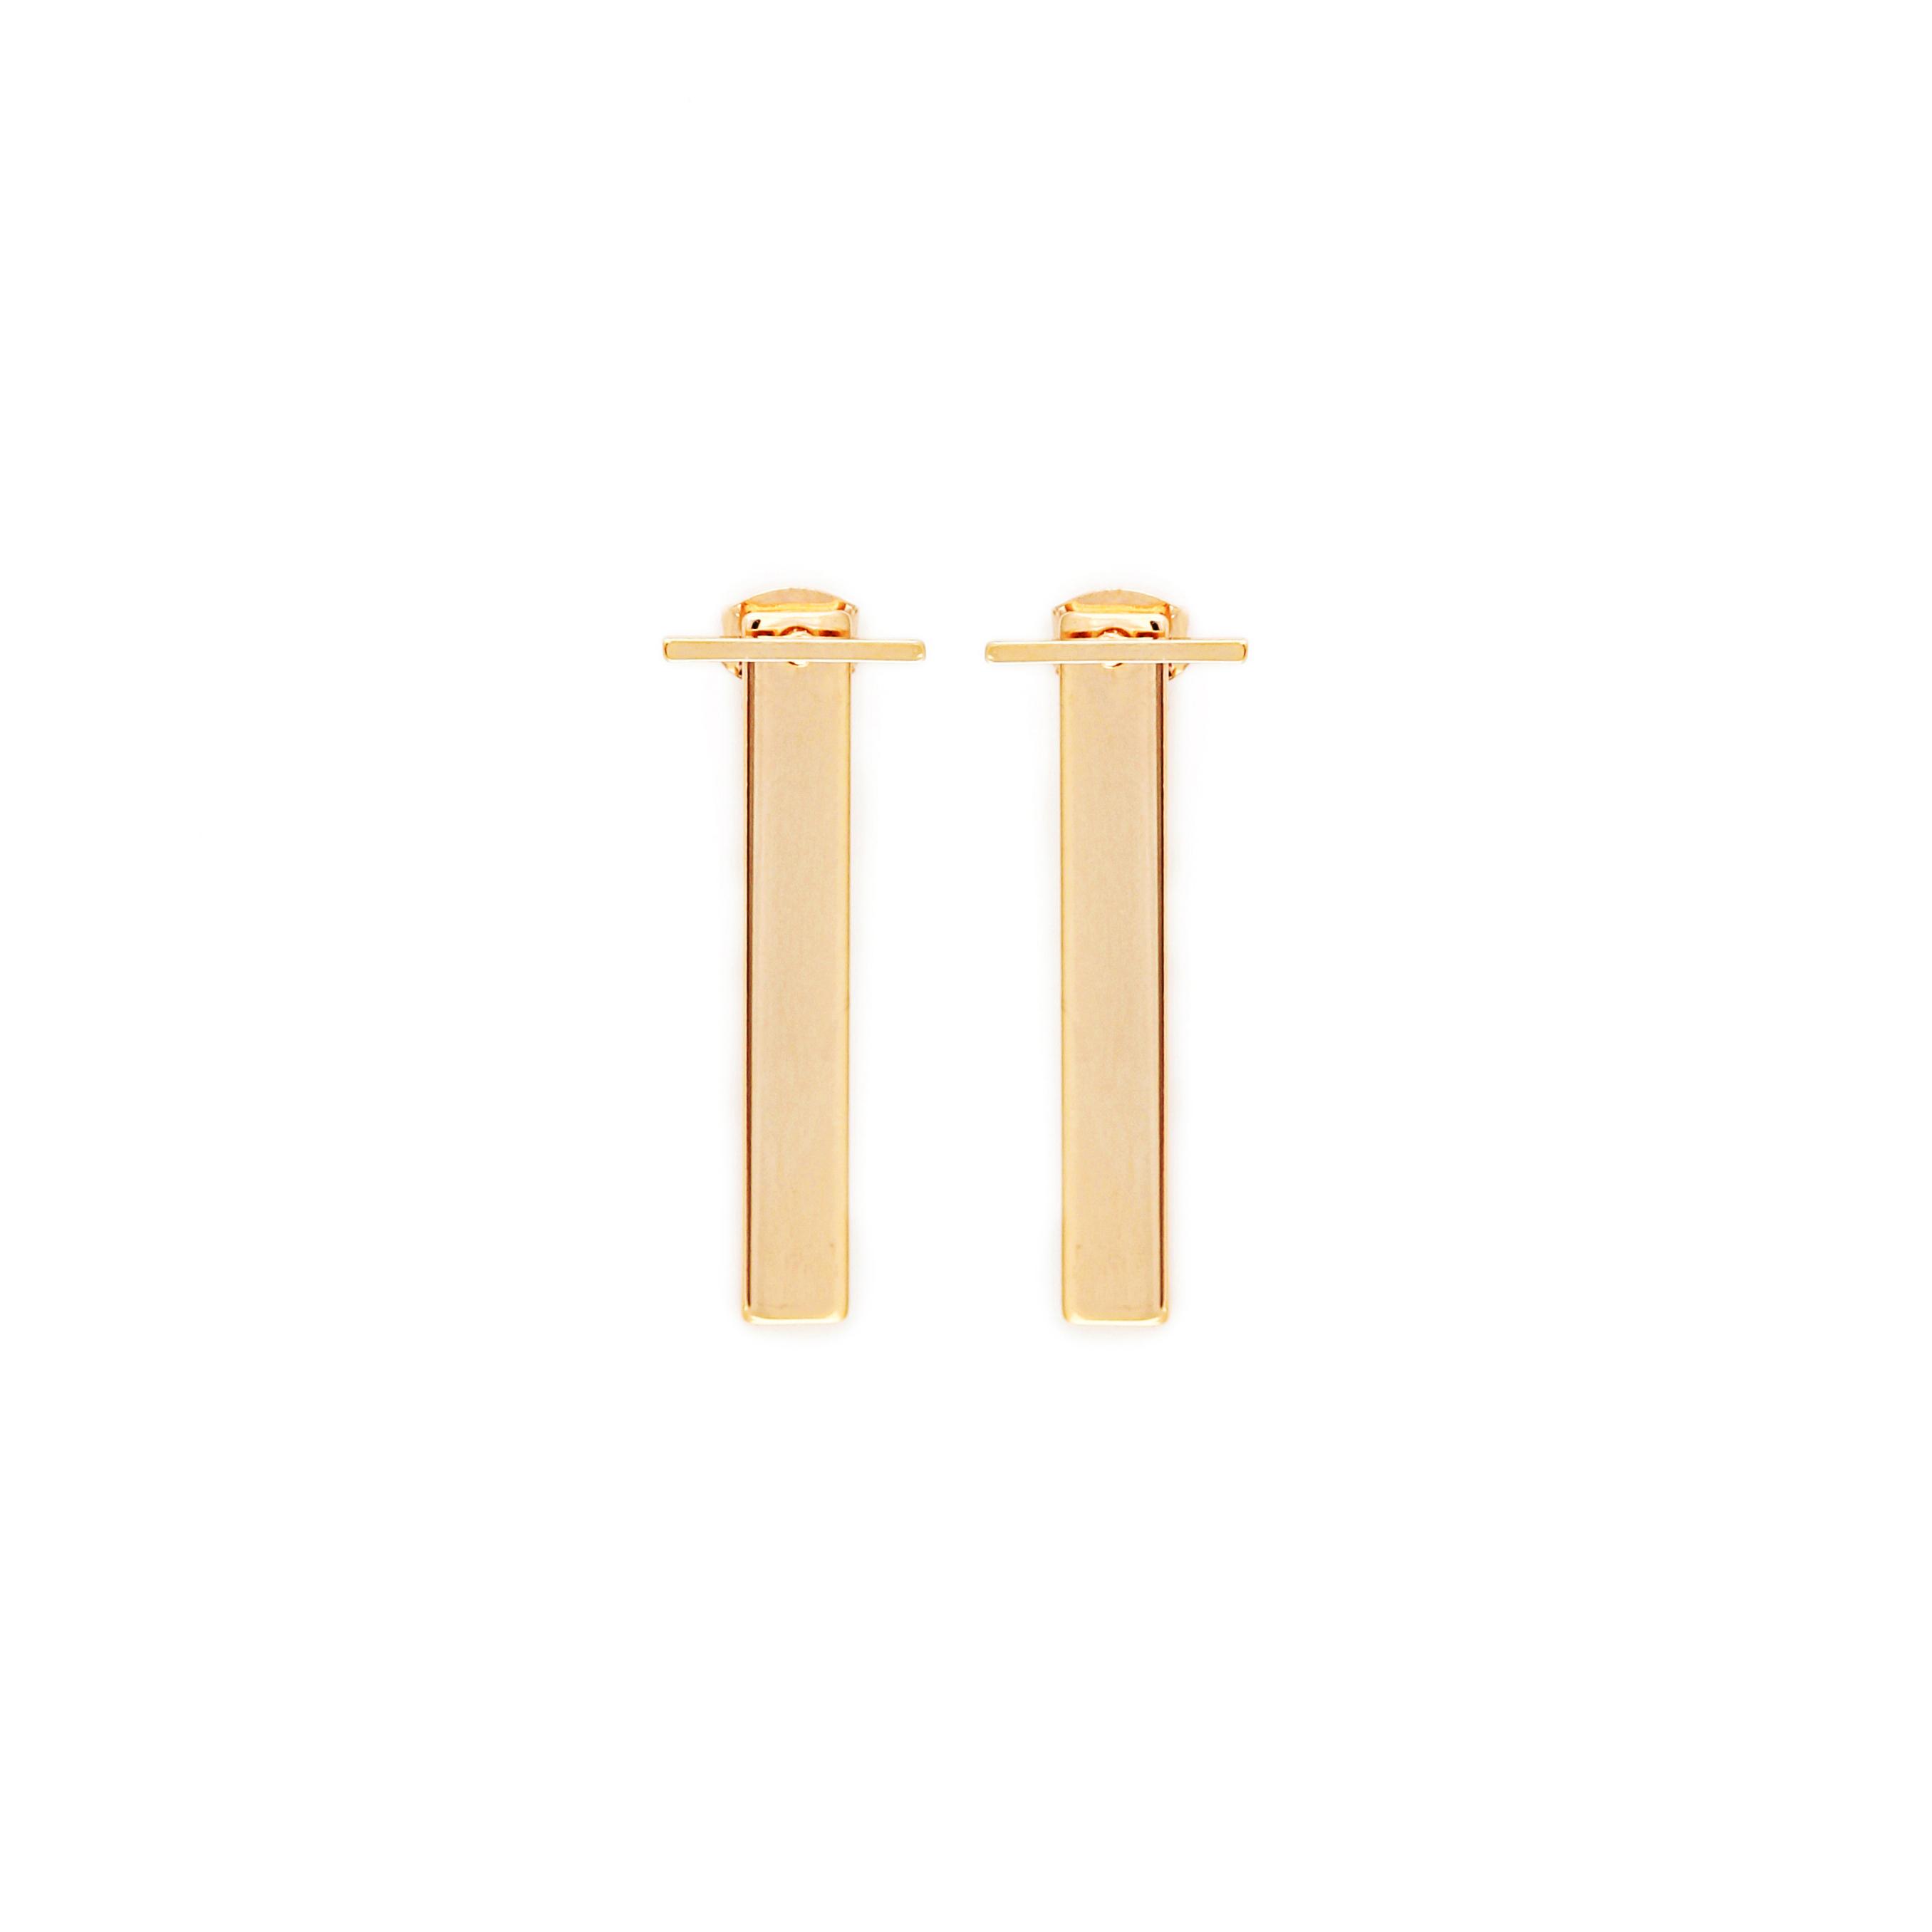 minimalistische stab ohrringe gold madeleine issing. Black Bedroom Furniture Sets. Home Design Ideas